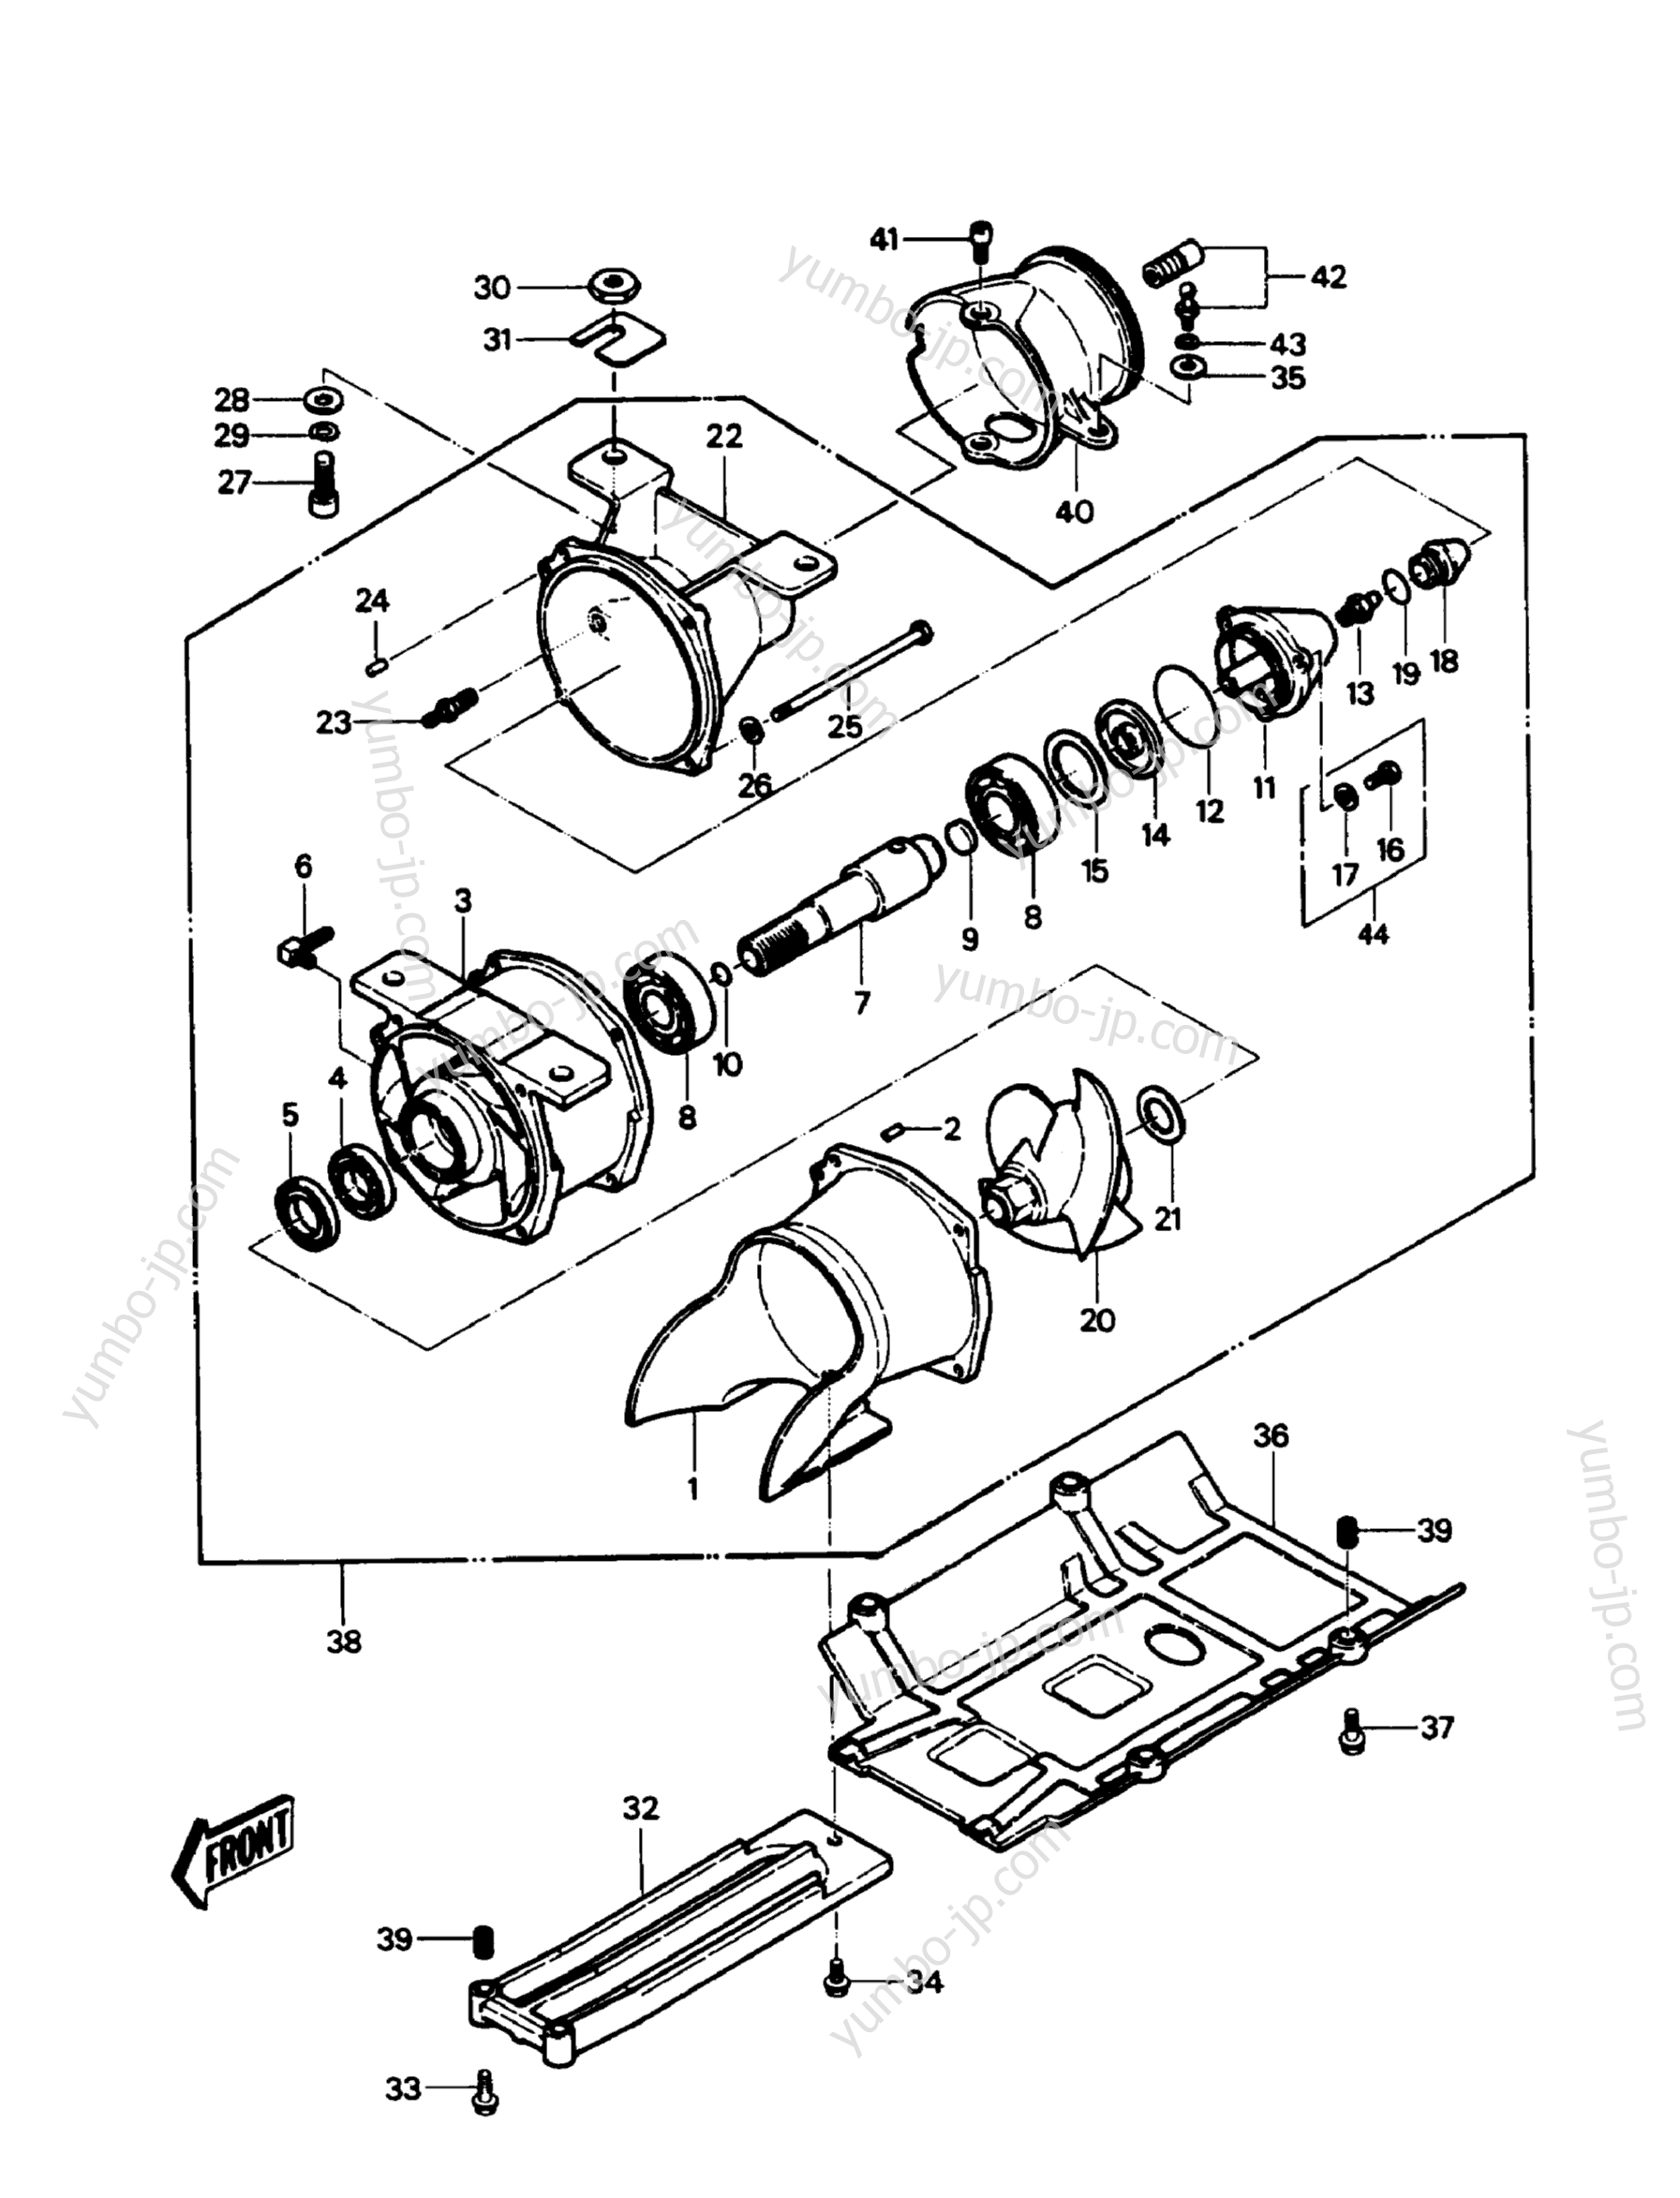 Jet Pump для гидроцикла KAWASAKI JST SKI 550 (JS550-A6) 1987 г.